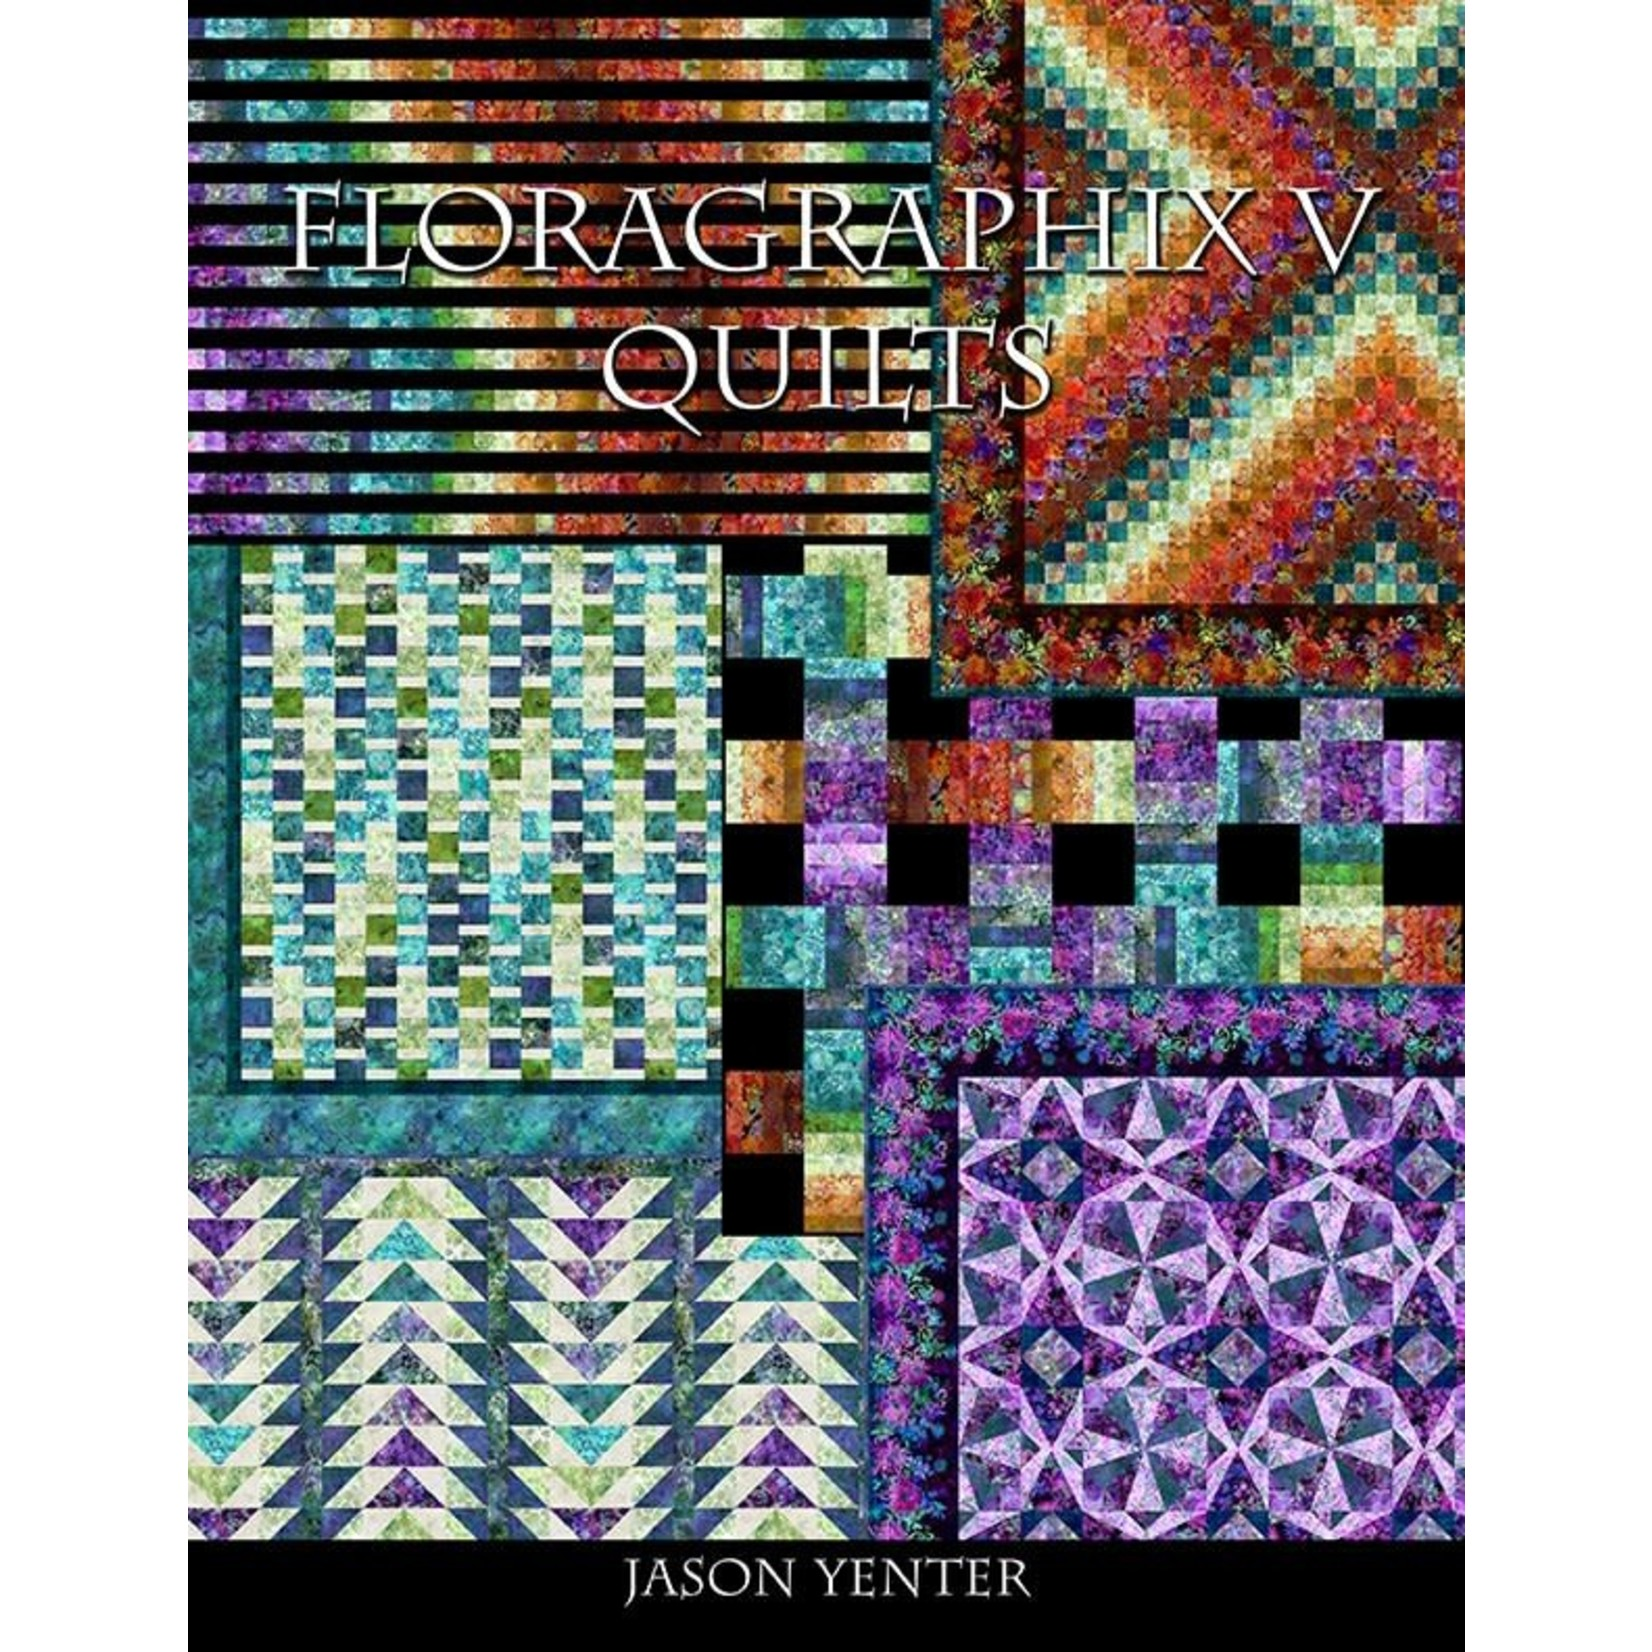 FLORAGRAPHIX V QUILTS BY JASON YENTER